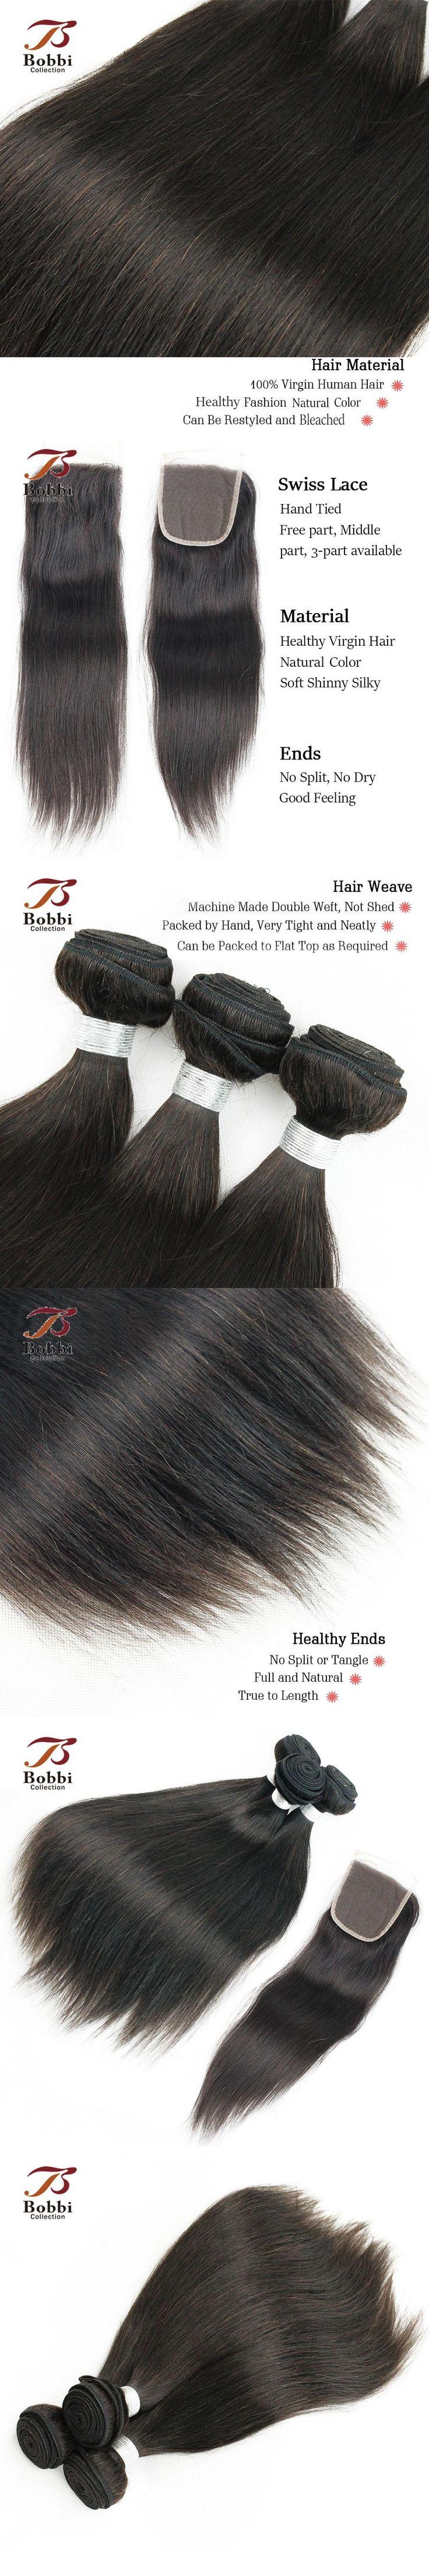 Malaysian Straight Hair Weave 3 Bundles With Closure Natural Color Malaysian Virgin Human Hair Extensions BOBBI COLLECTION